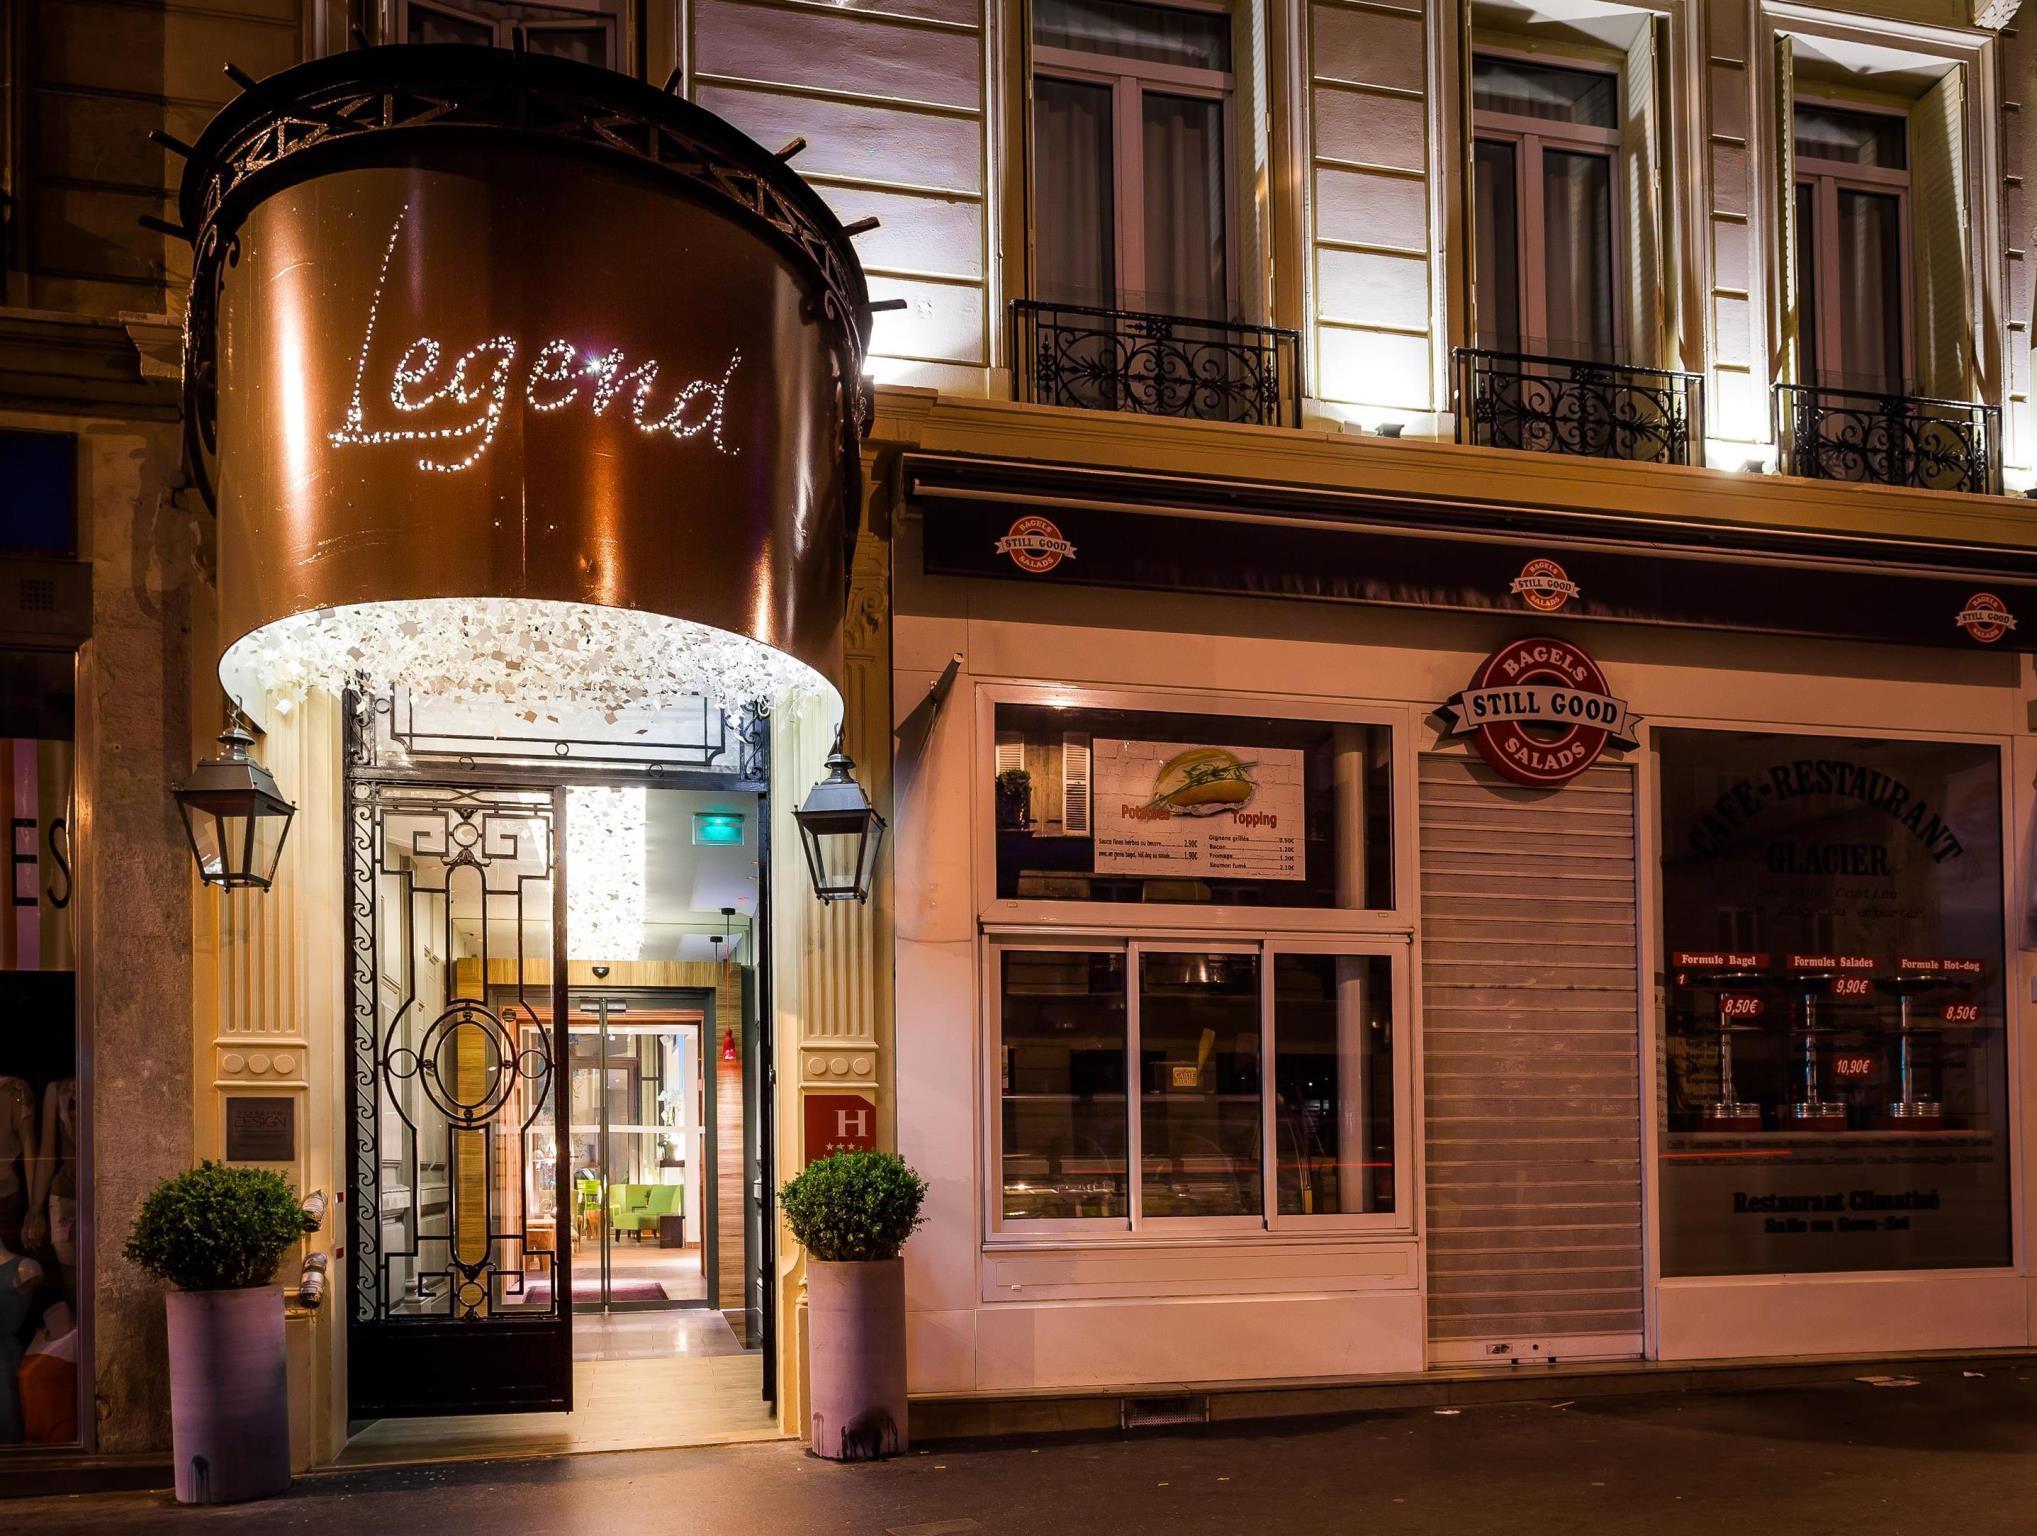 Legend Saint Germain Hotel by Elegancia